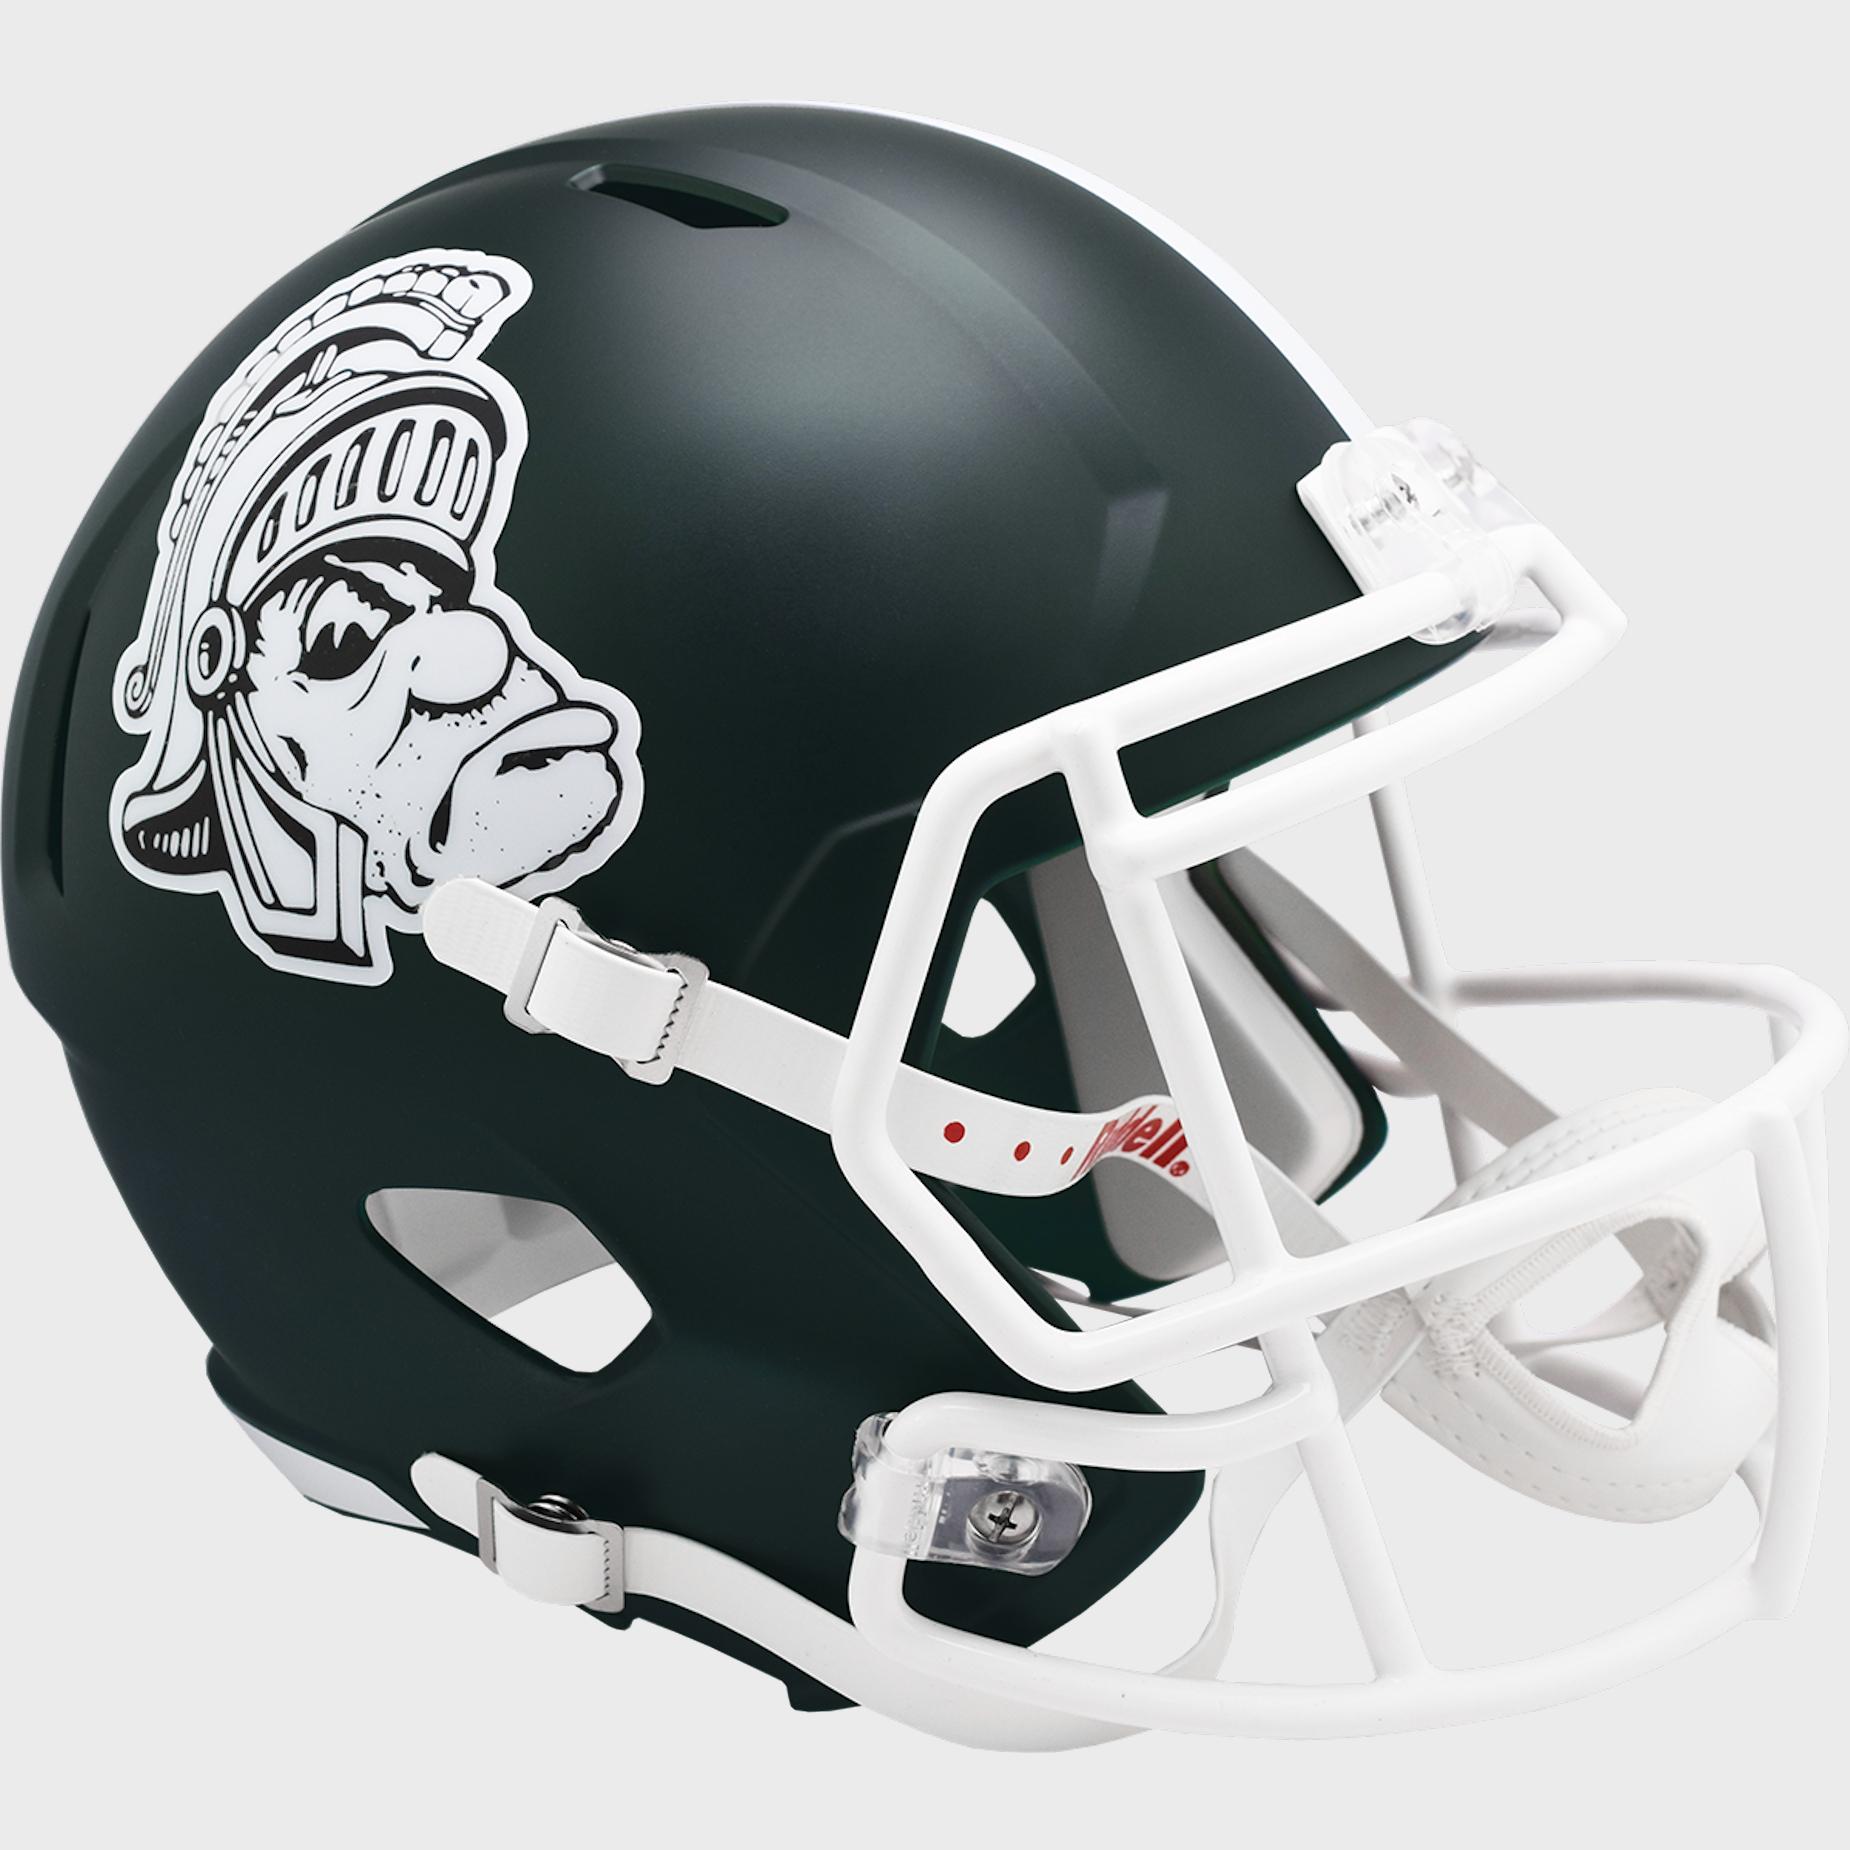 Michigan State Spartans Speed Replica Football Helmet <B>Gruff Sparty</B>